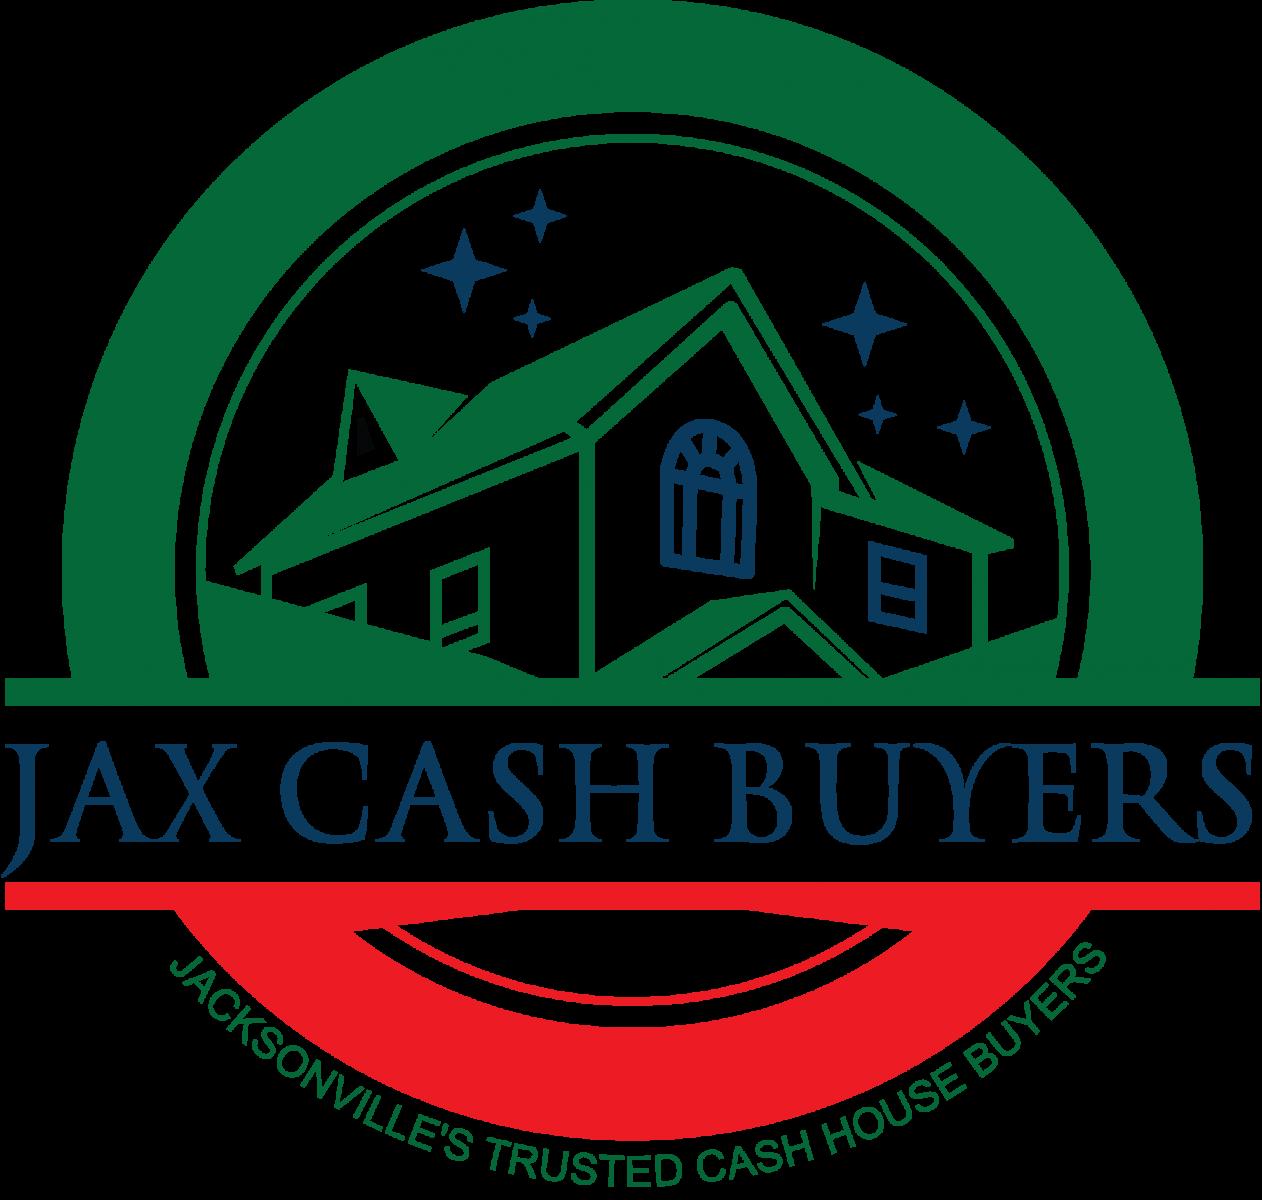 Jax Cash Buyers logo